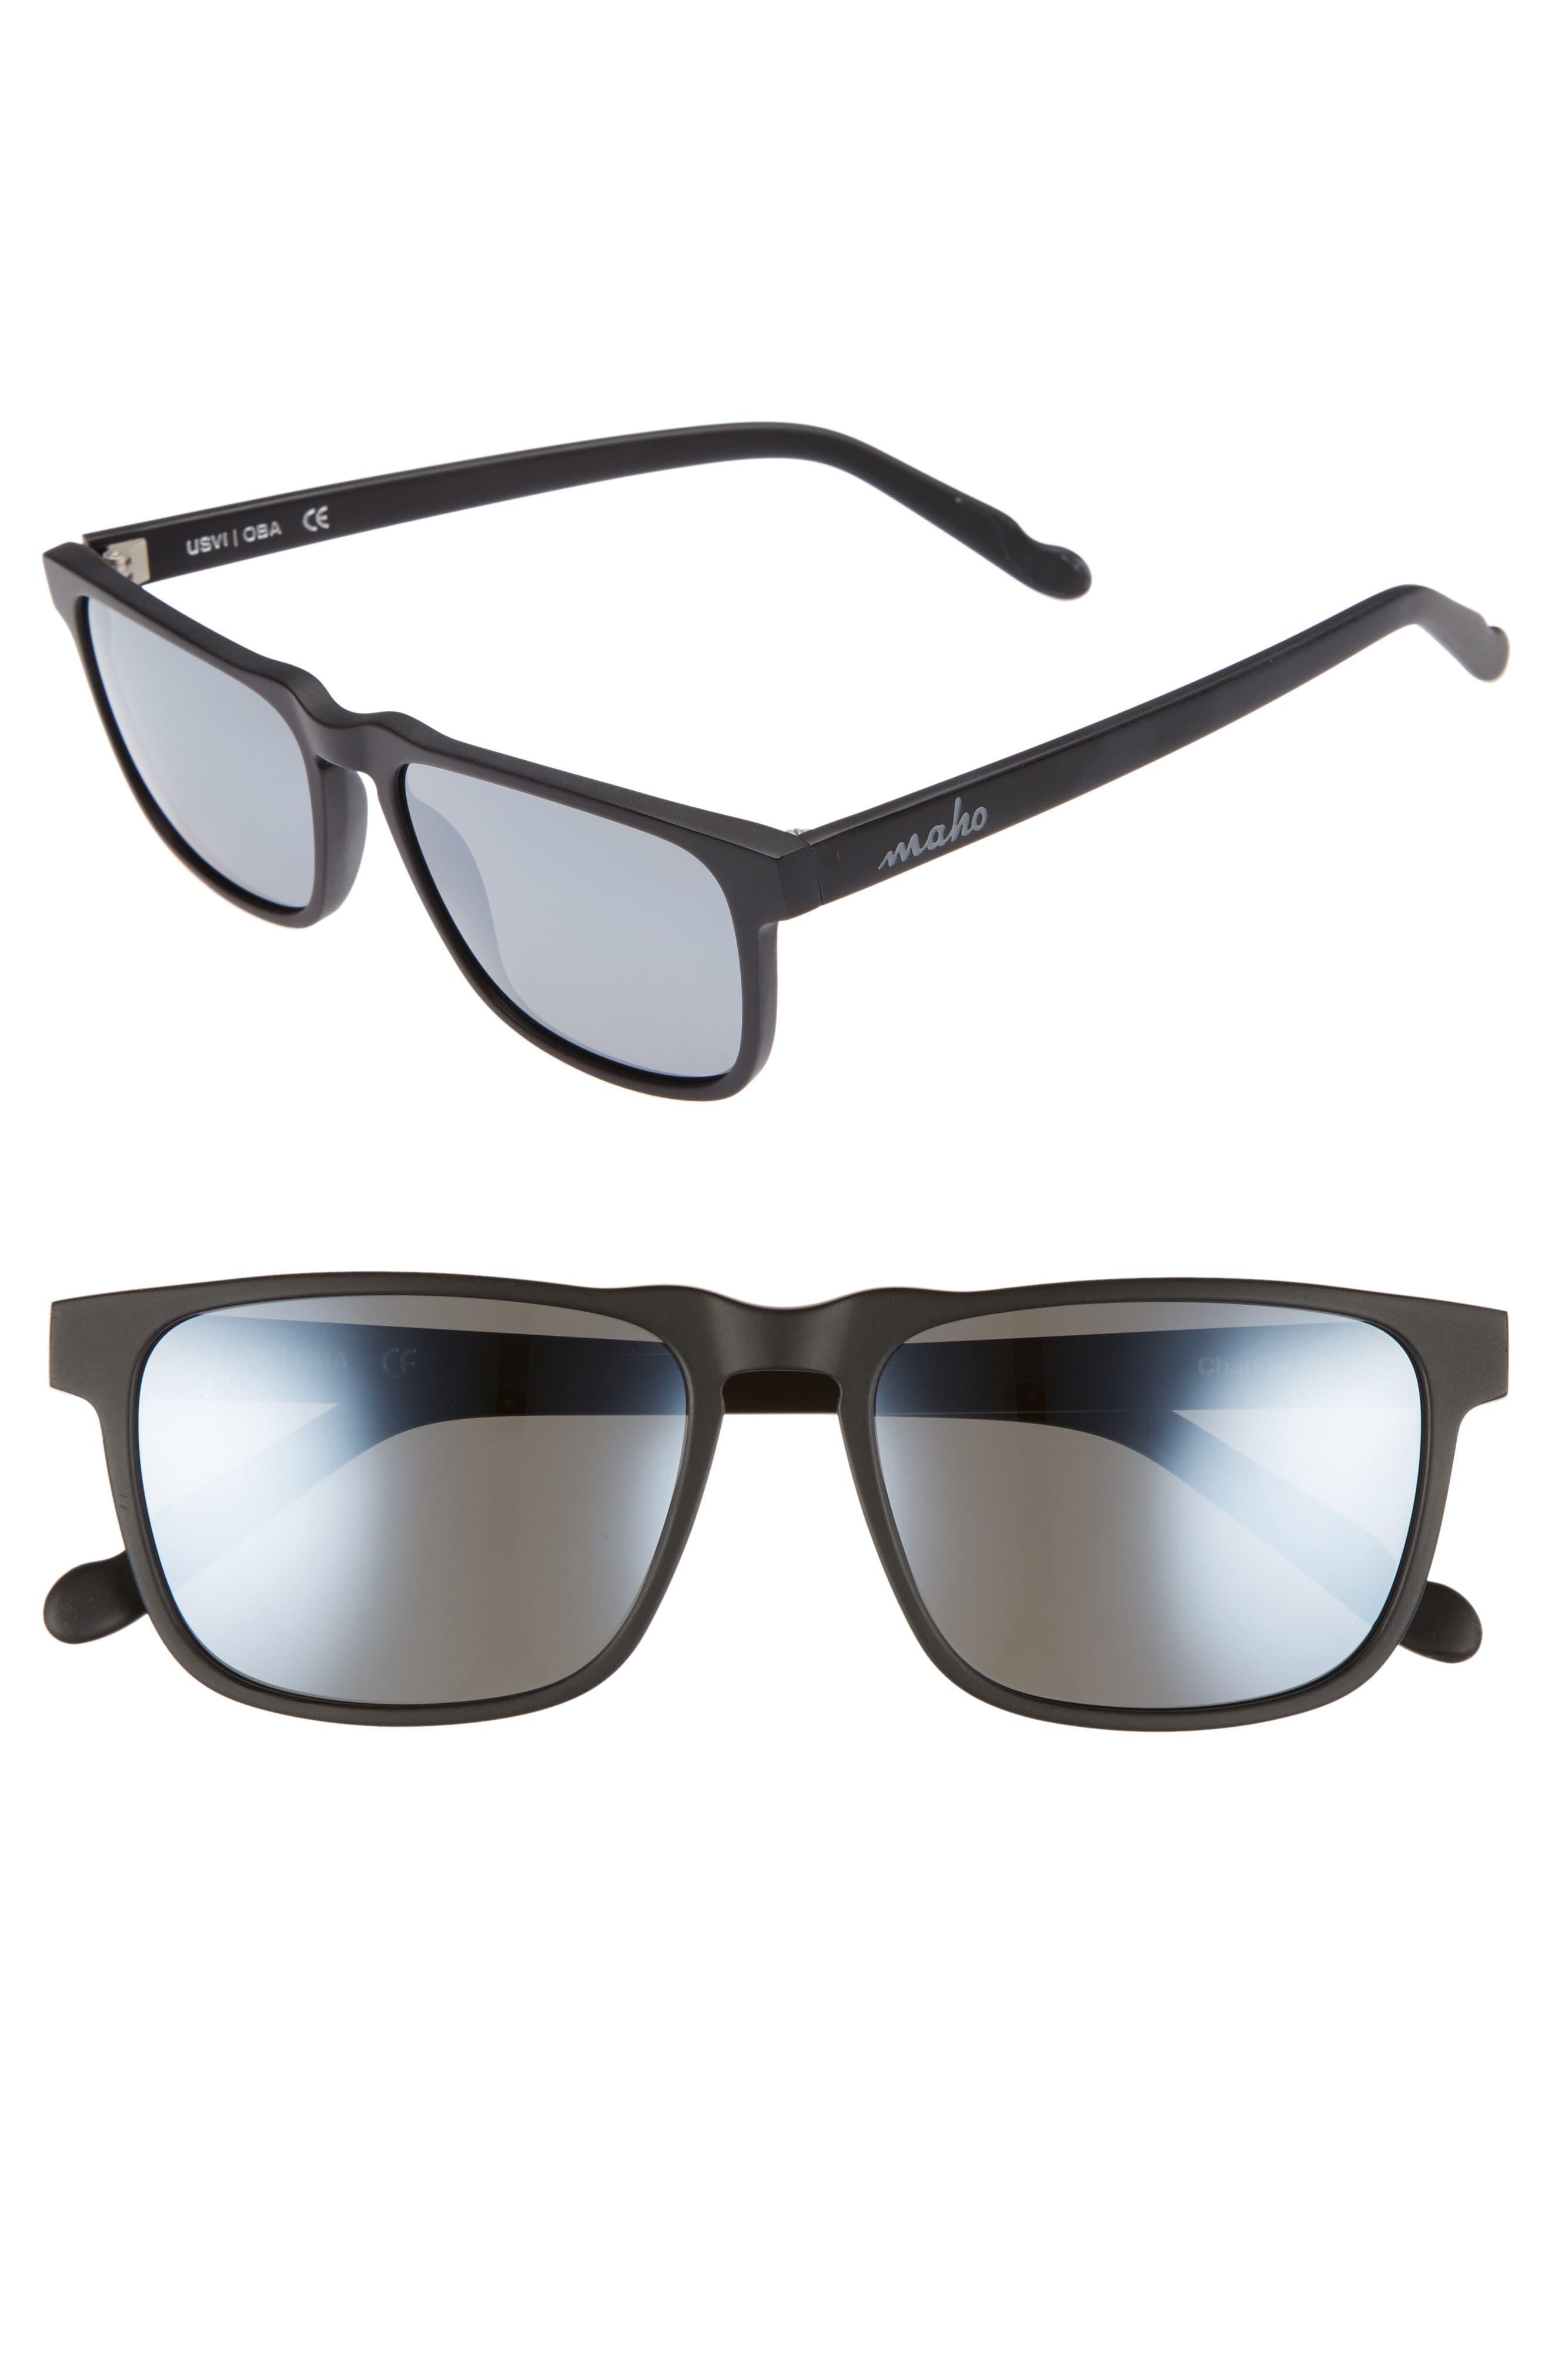 Main Image - Maho Chandeleur 59mm Polarized Aviator Sunglasses